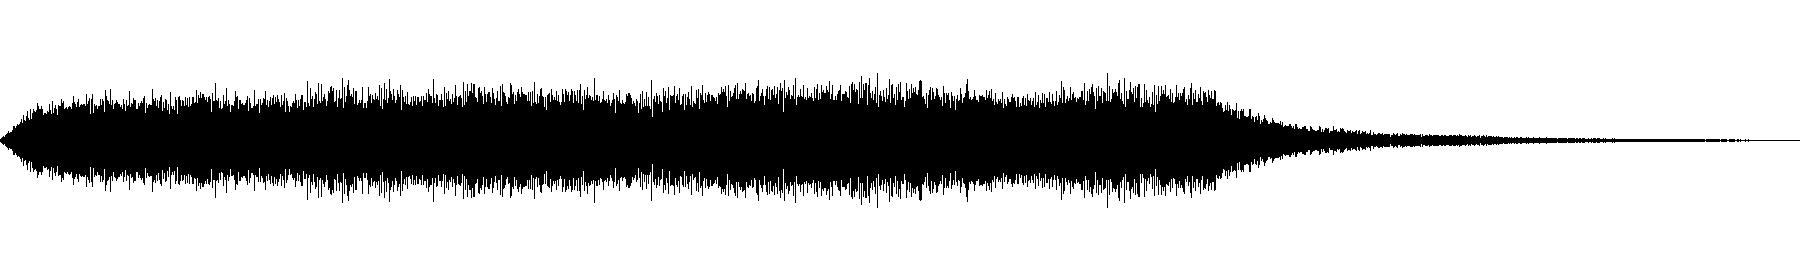 organ am